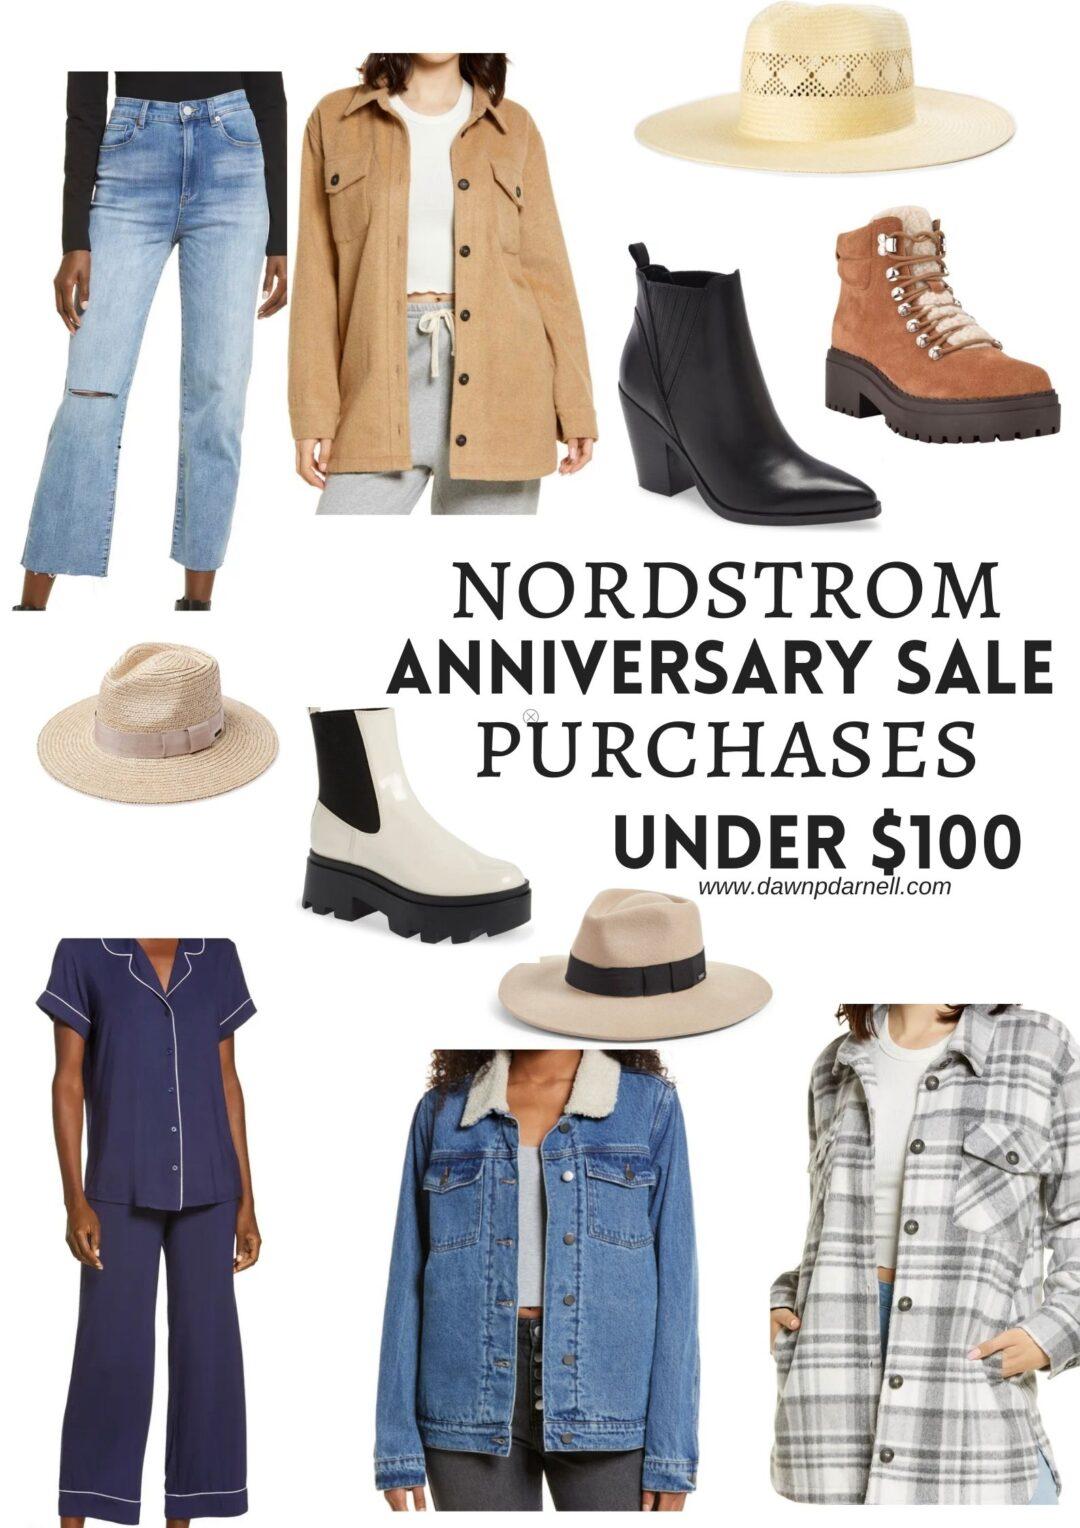 #nsale, Nordstrom anniversary sale, Marc Fisher boots, denim shearling jacket